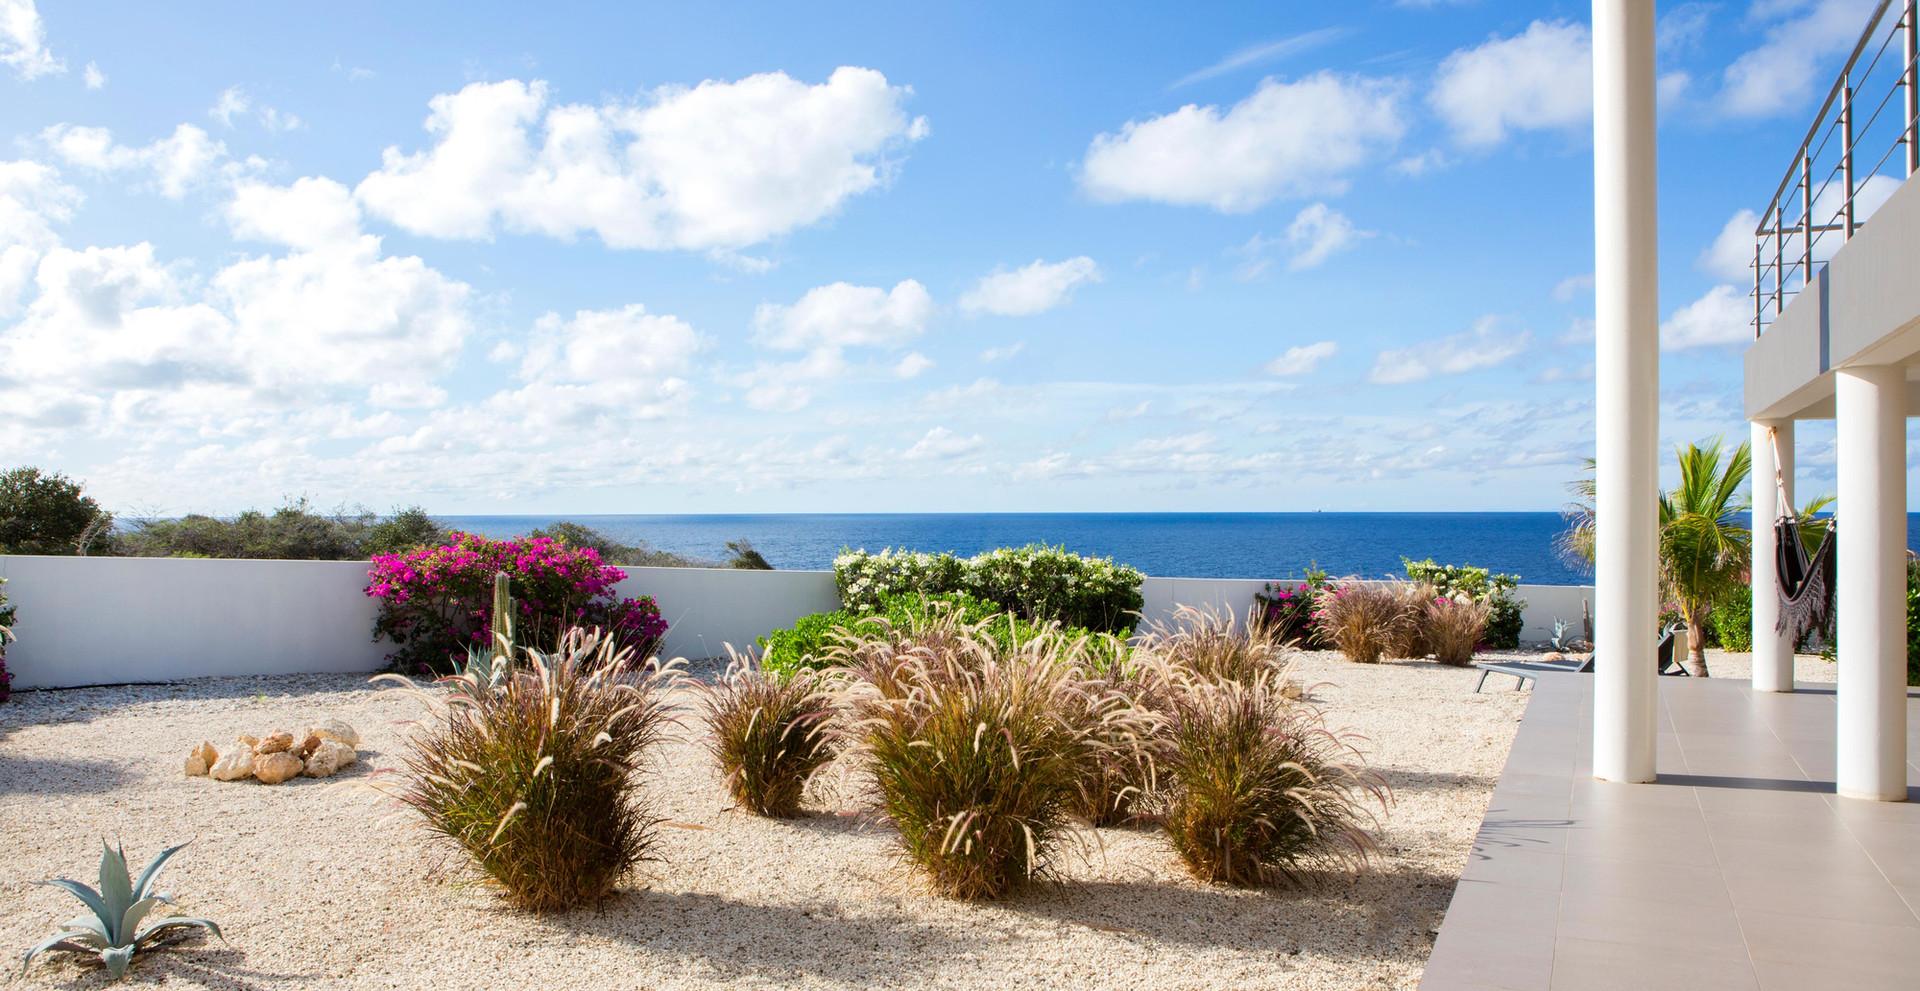 5W1A3837-Foto-Lau-Curacao-gentil-263.jpg